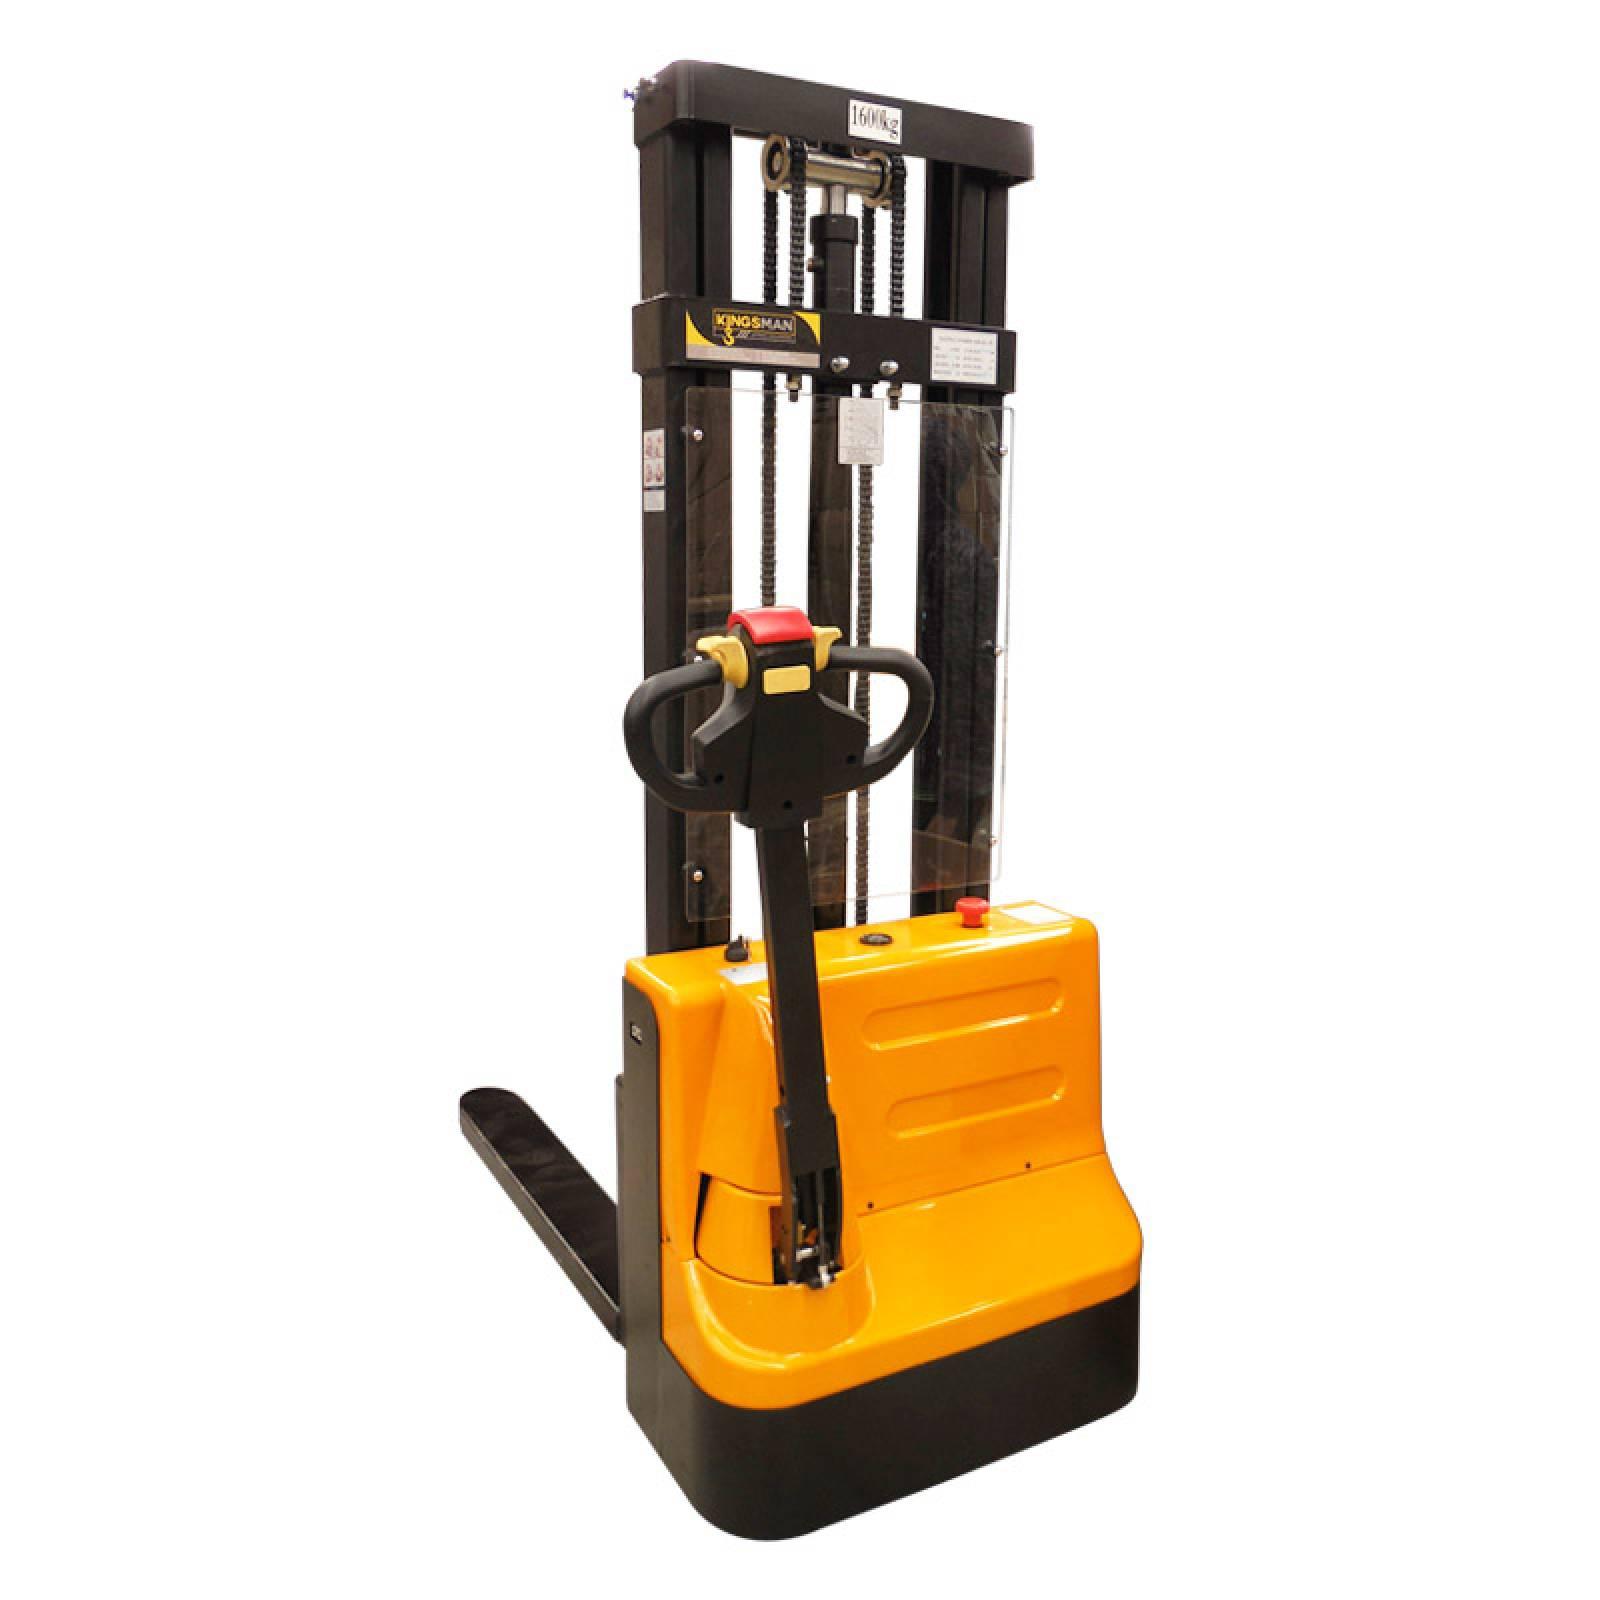 Patin Montacargas Apilador Electrico Cap 1.6 Ton 3m Kingsman